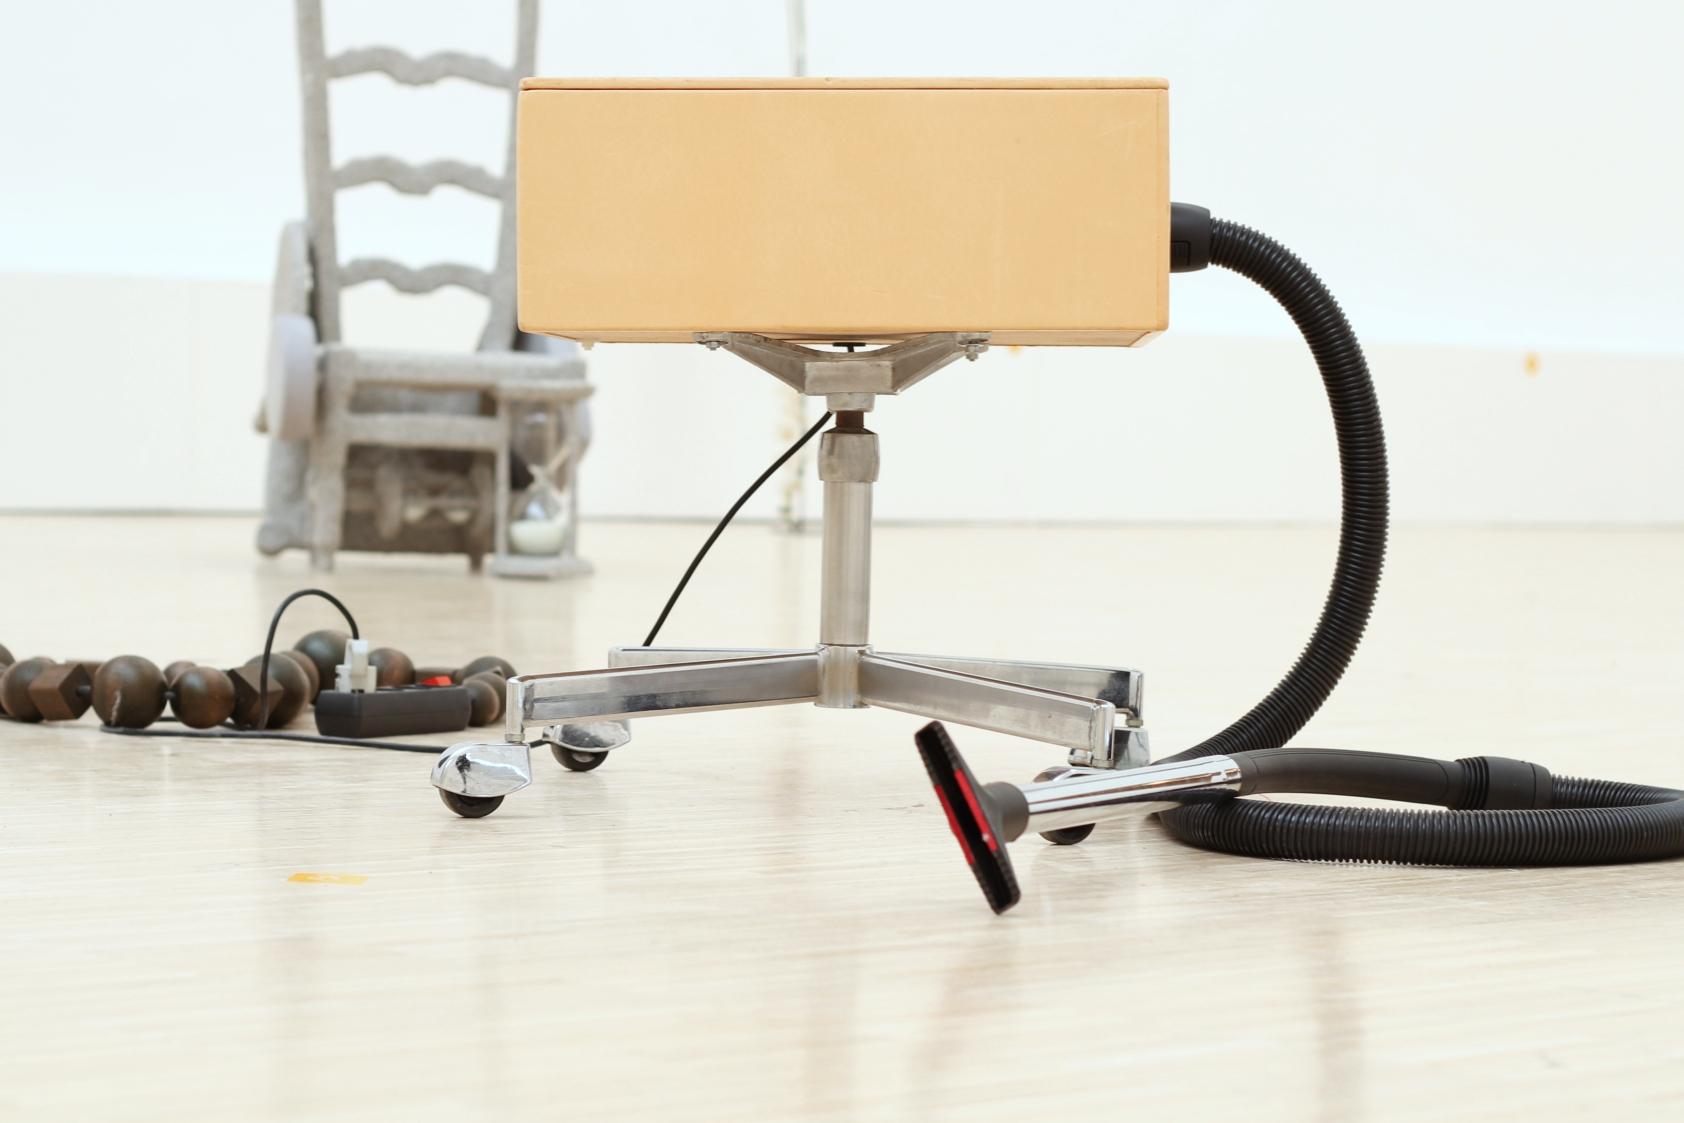 51. BLESS N° 17 Design Relativators, Vacuum Cleaner 2, 2002_wystawa poręczne